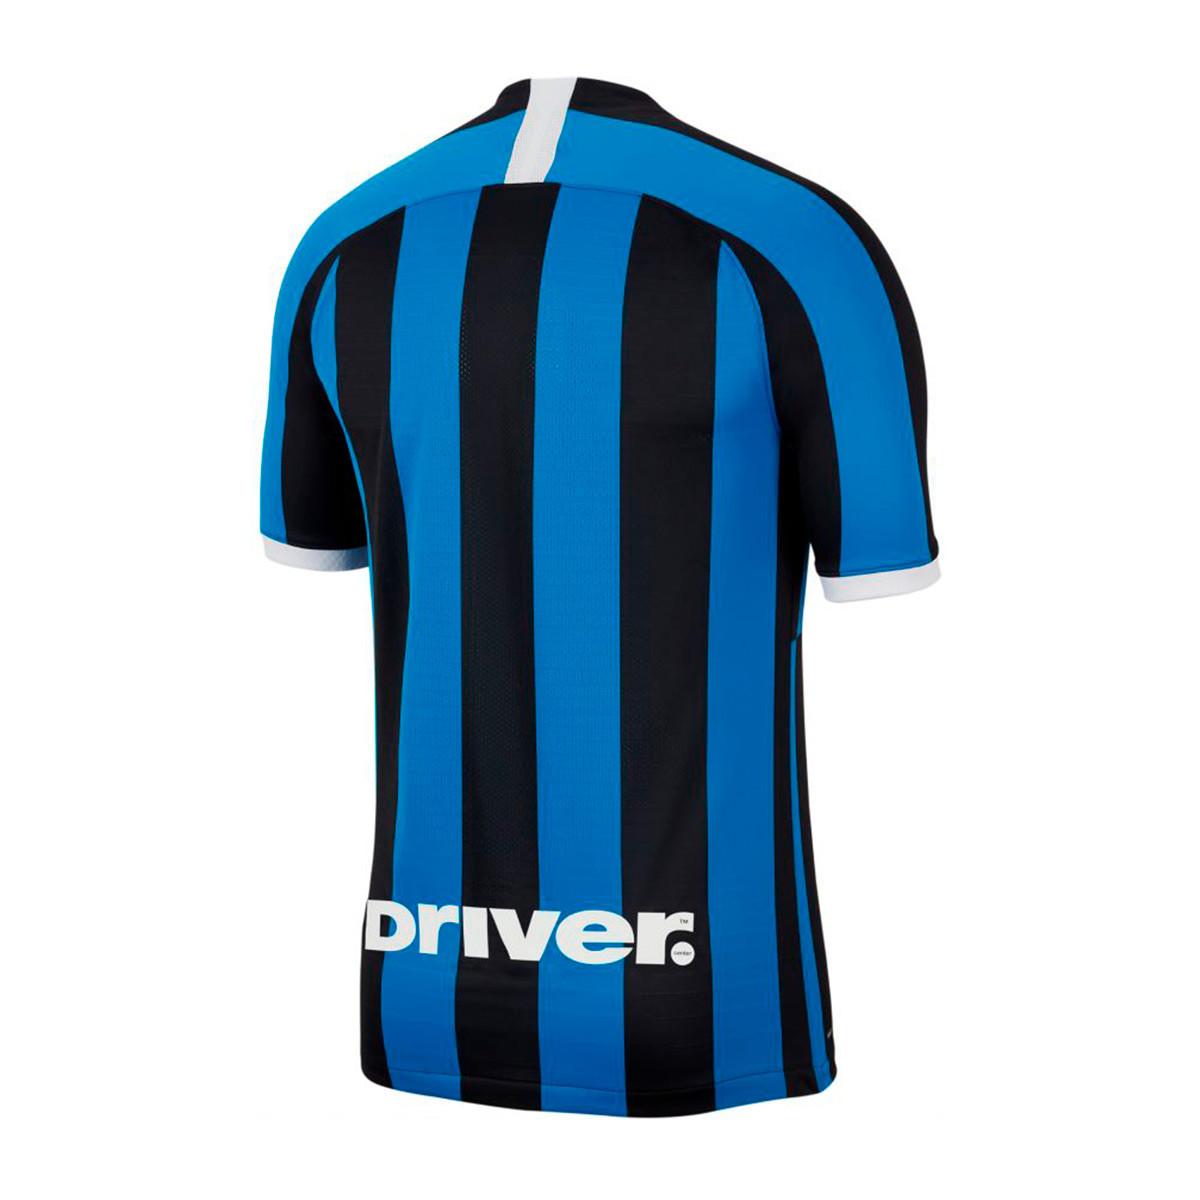 d3dde1b9 Jersey Nike Inter Milán Vapor Match SS Primera Equipación 2019-2020 ...